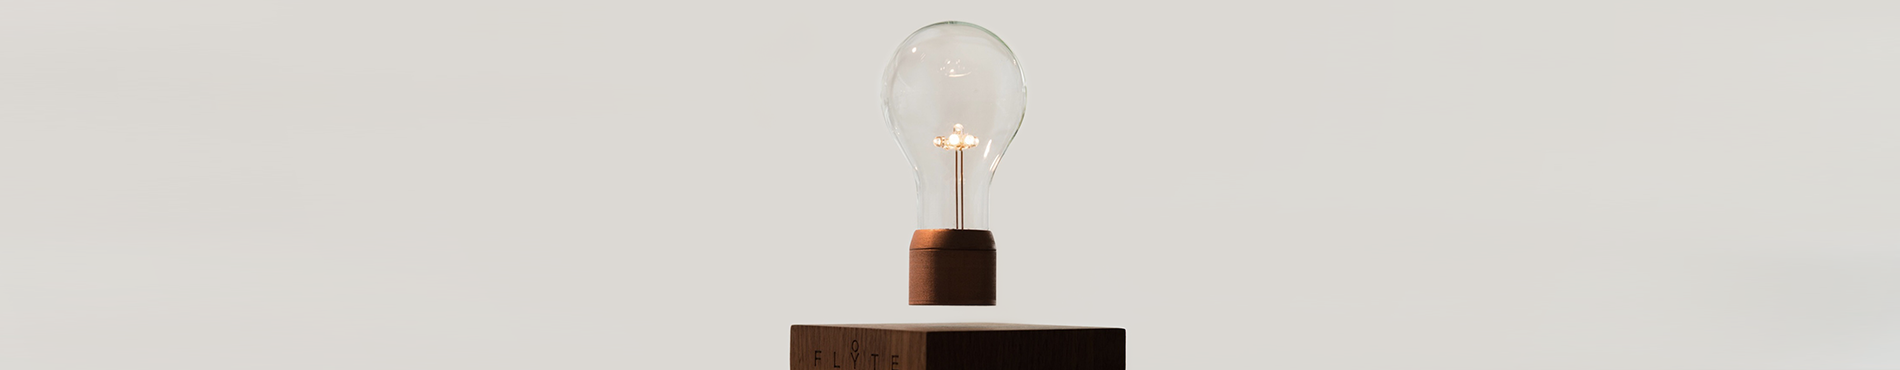 BANNER-CADEAUXPERTS-levitating-light